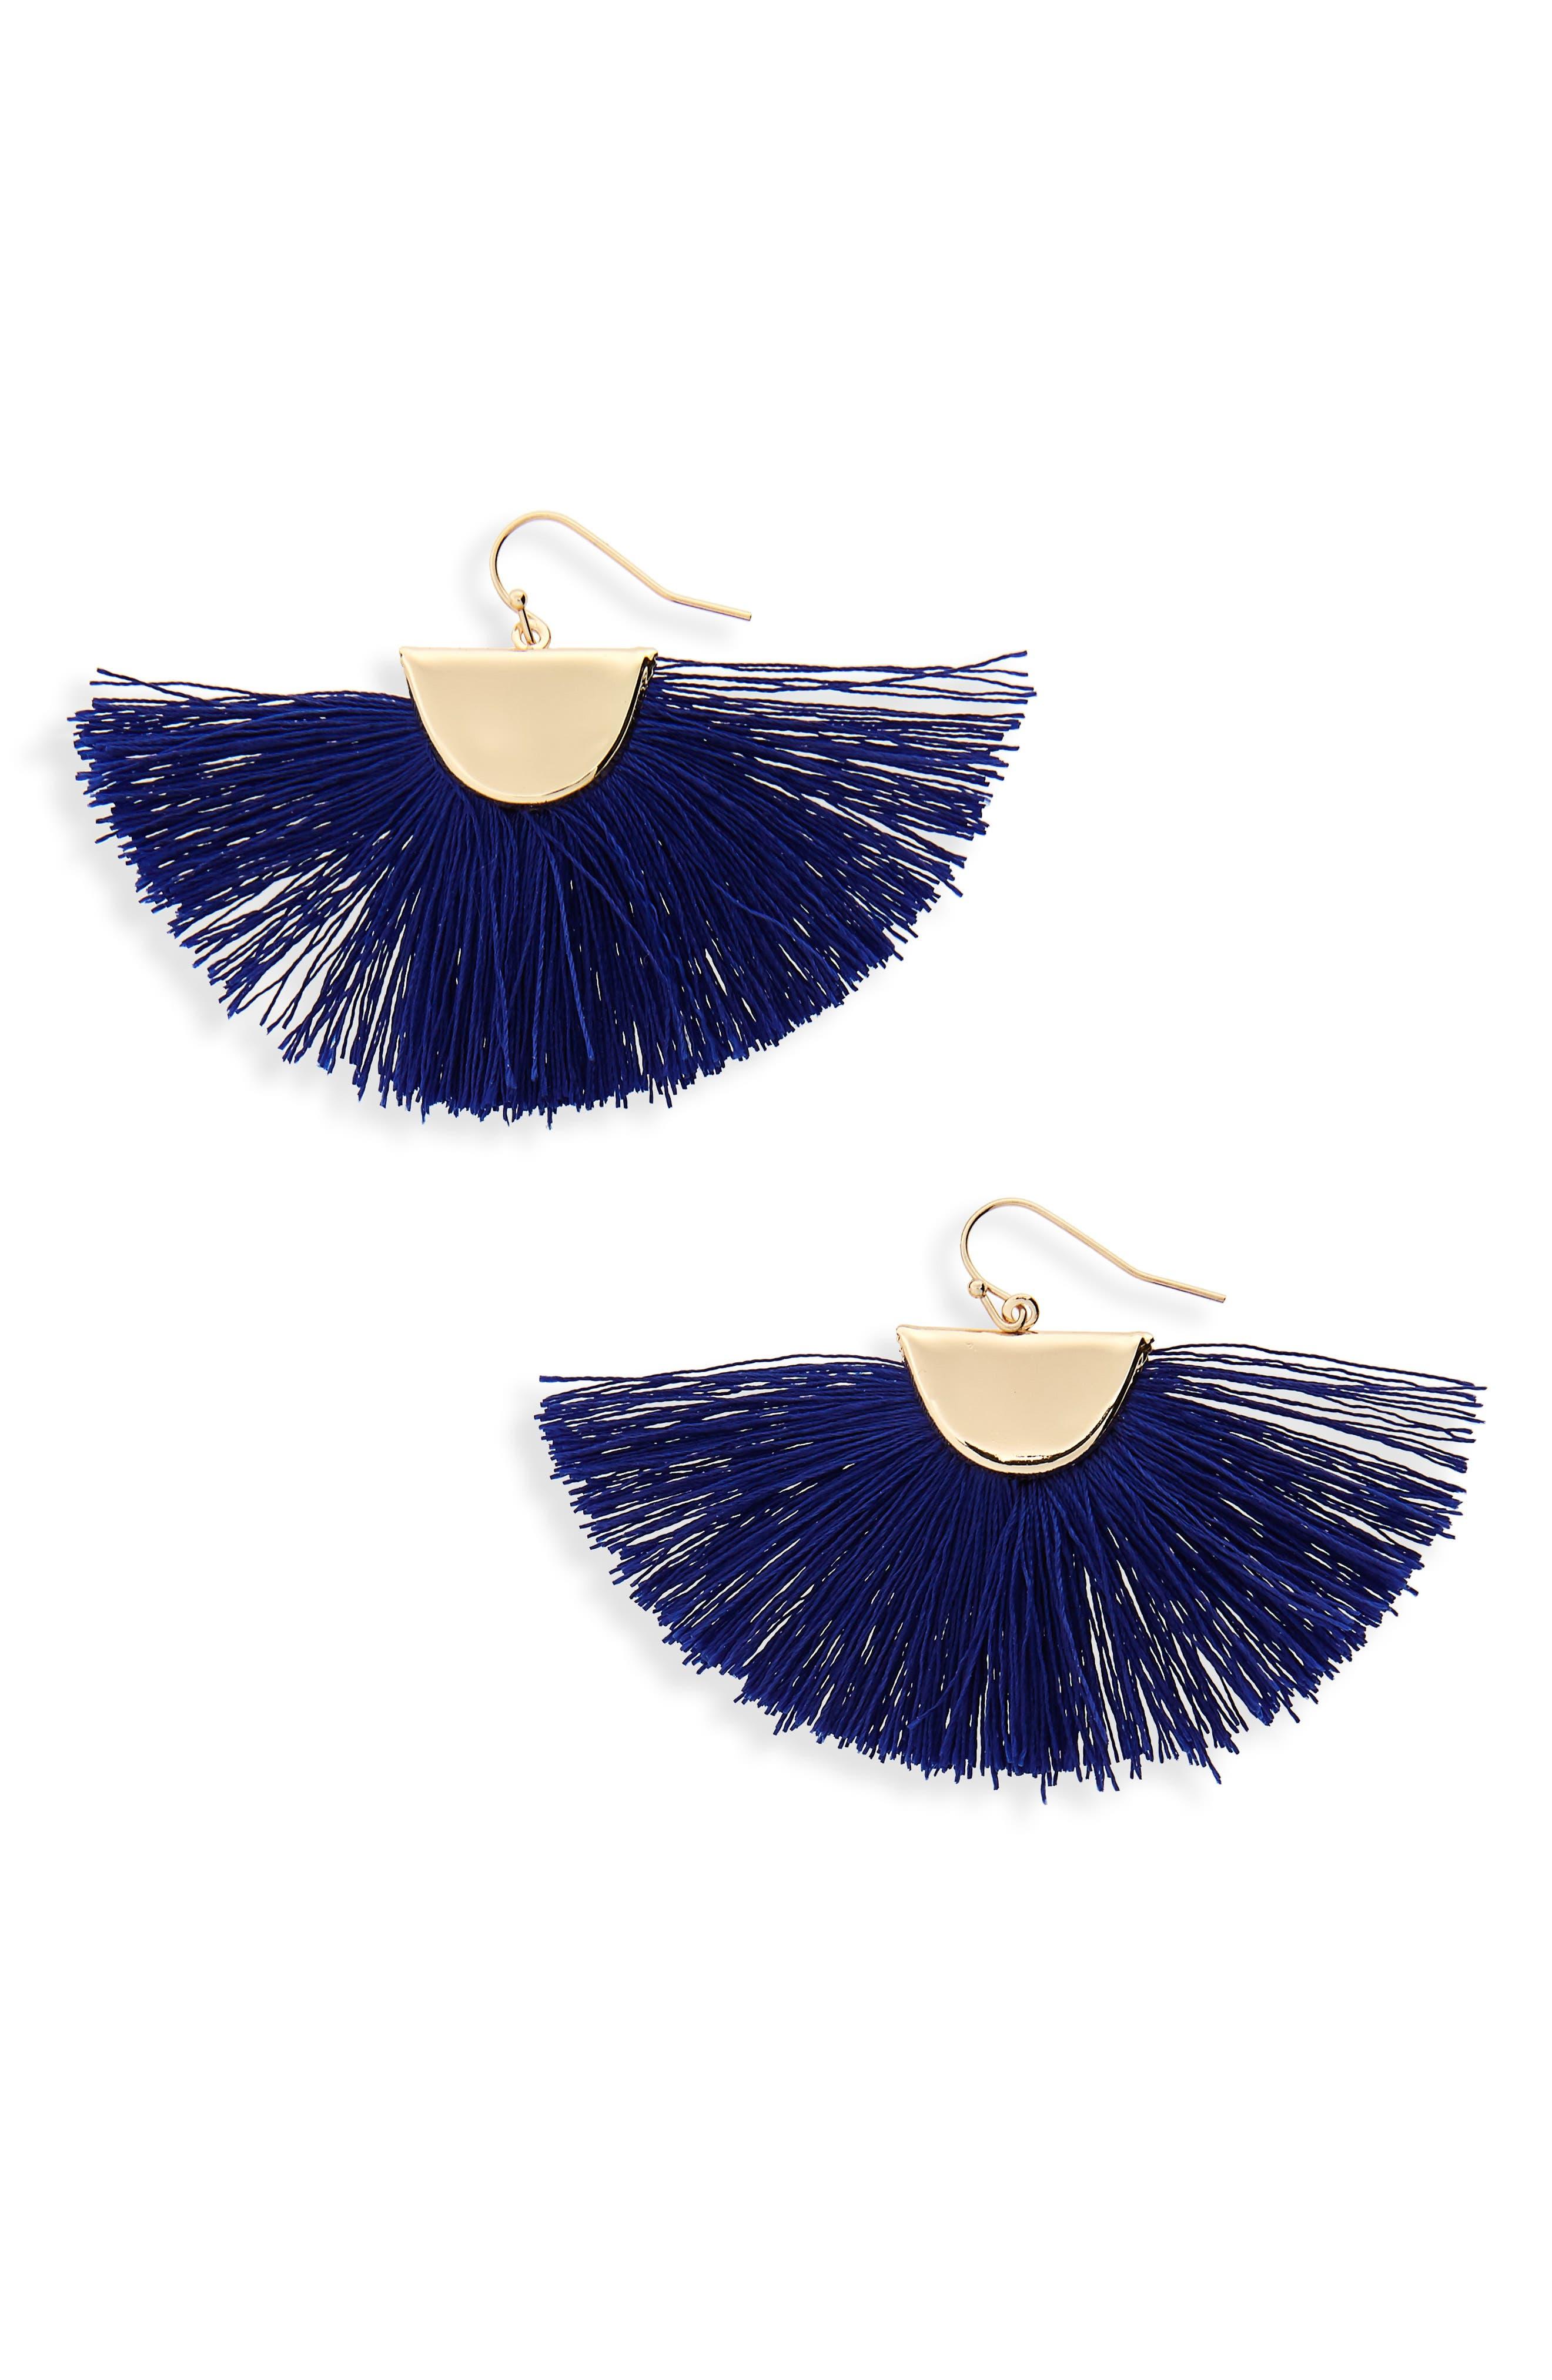 Fan Drop Earrings,                             Main thumbnail 1, color,                             Blue